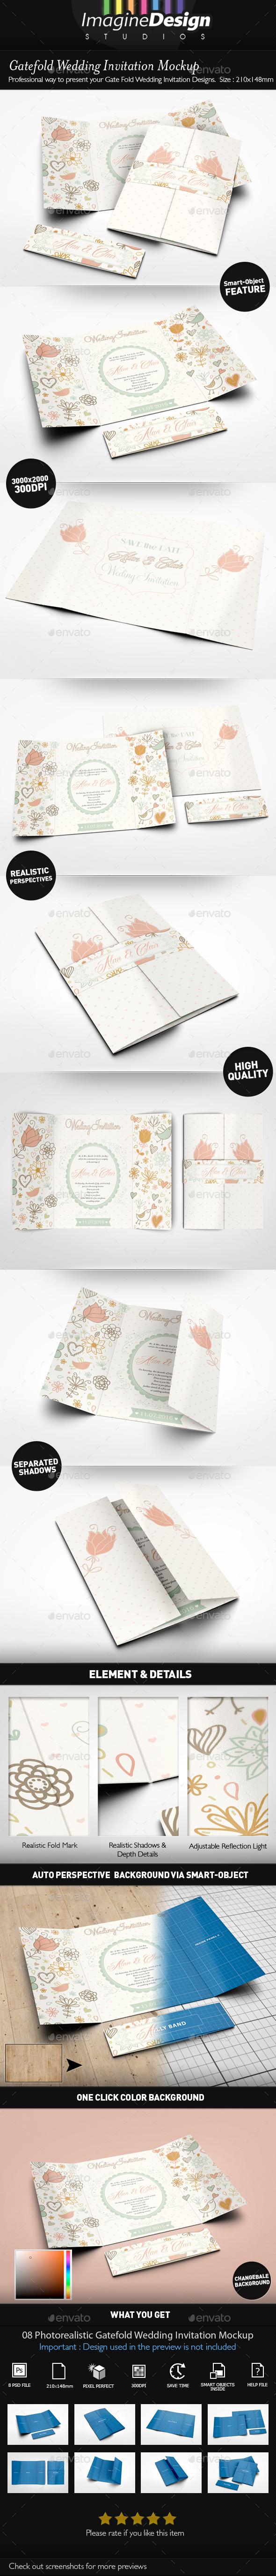 Gatefold Wedding Invitation Mockup - Miscellaneous Print